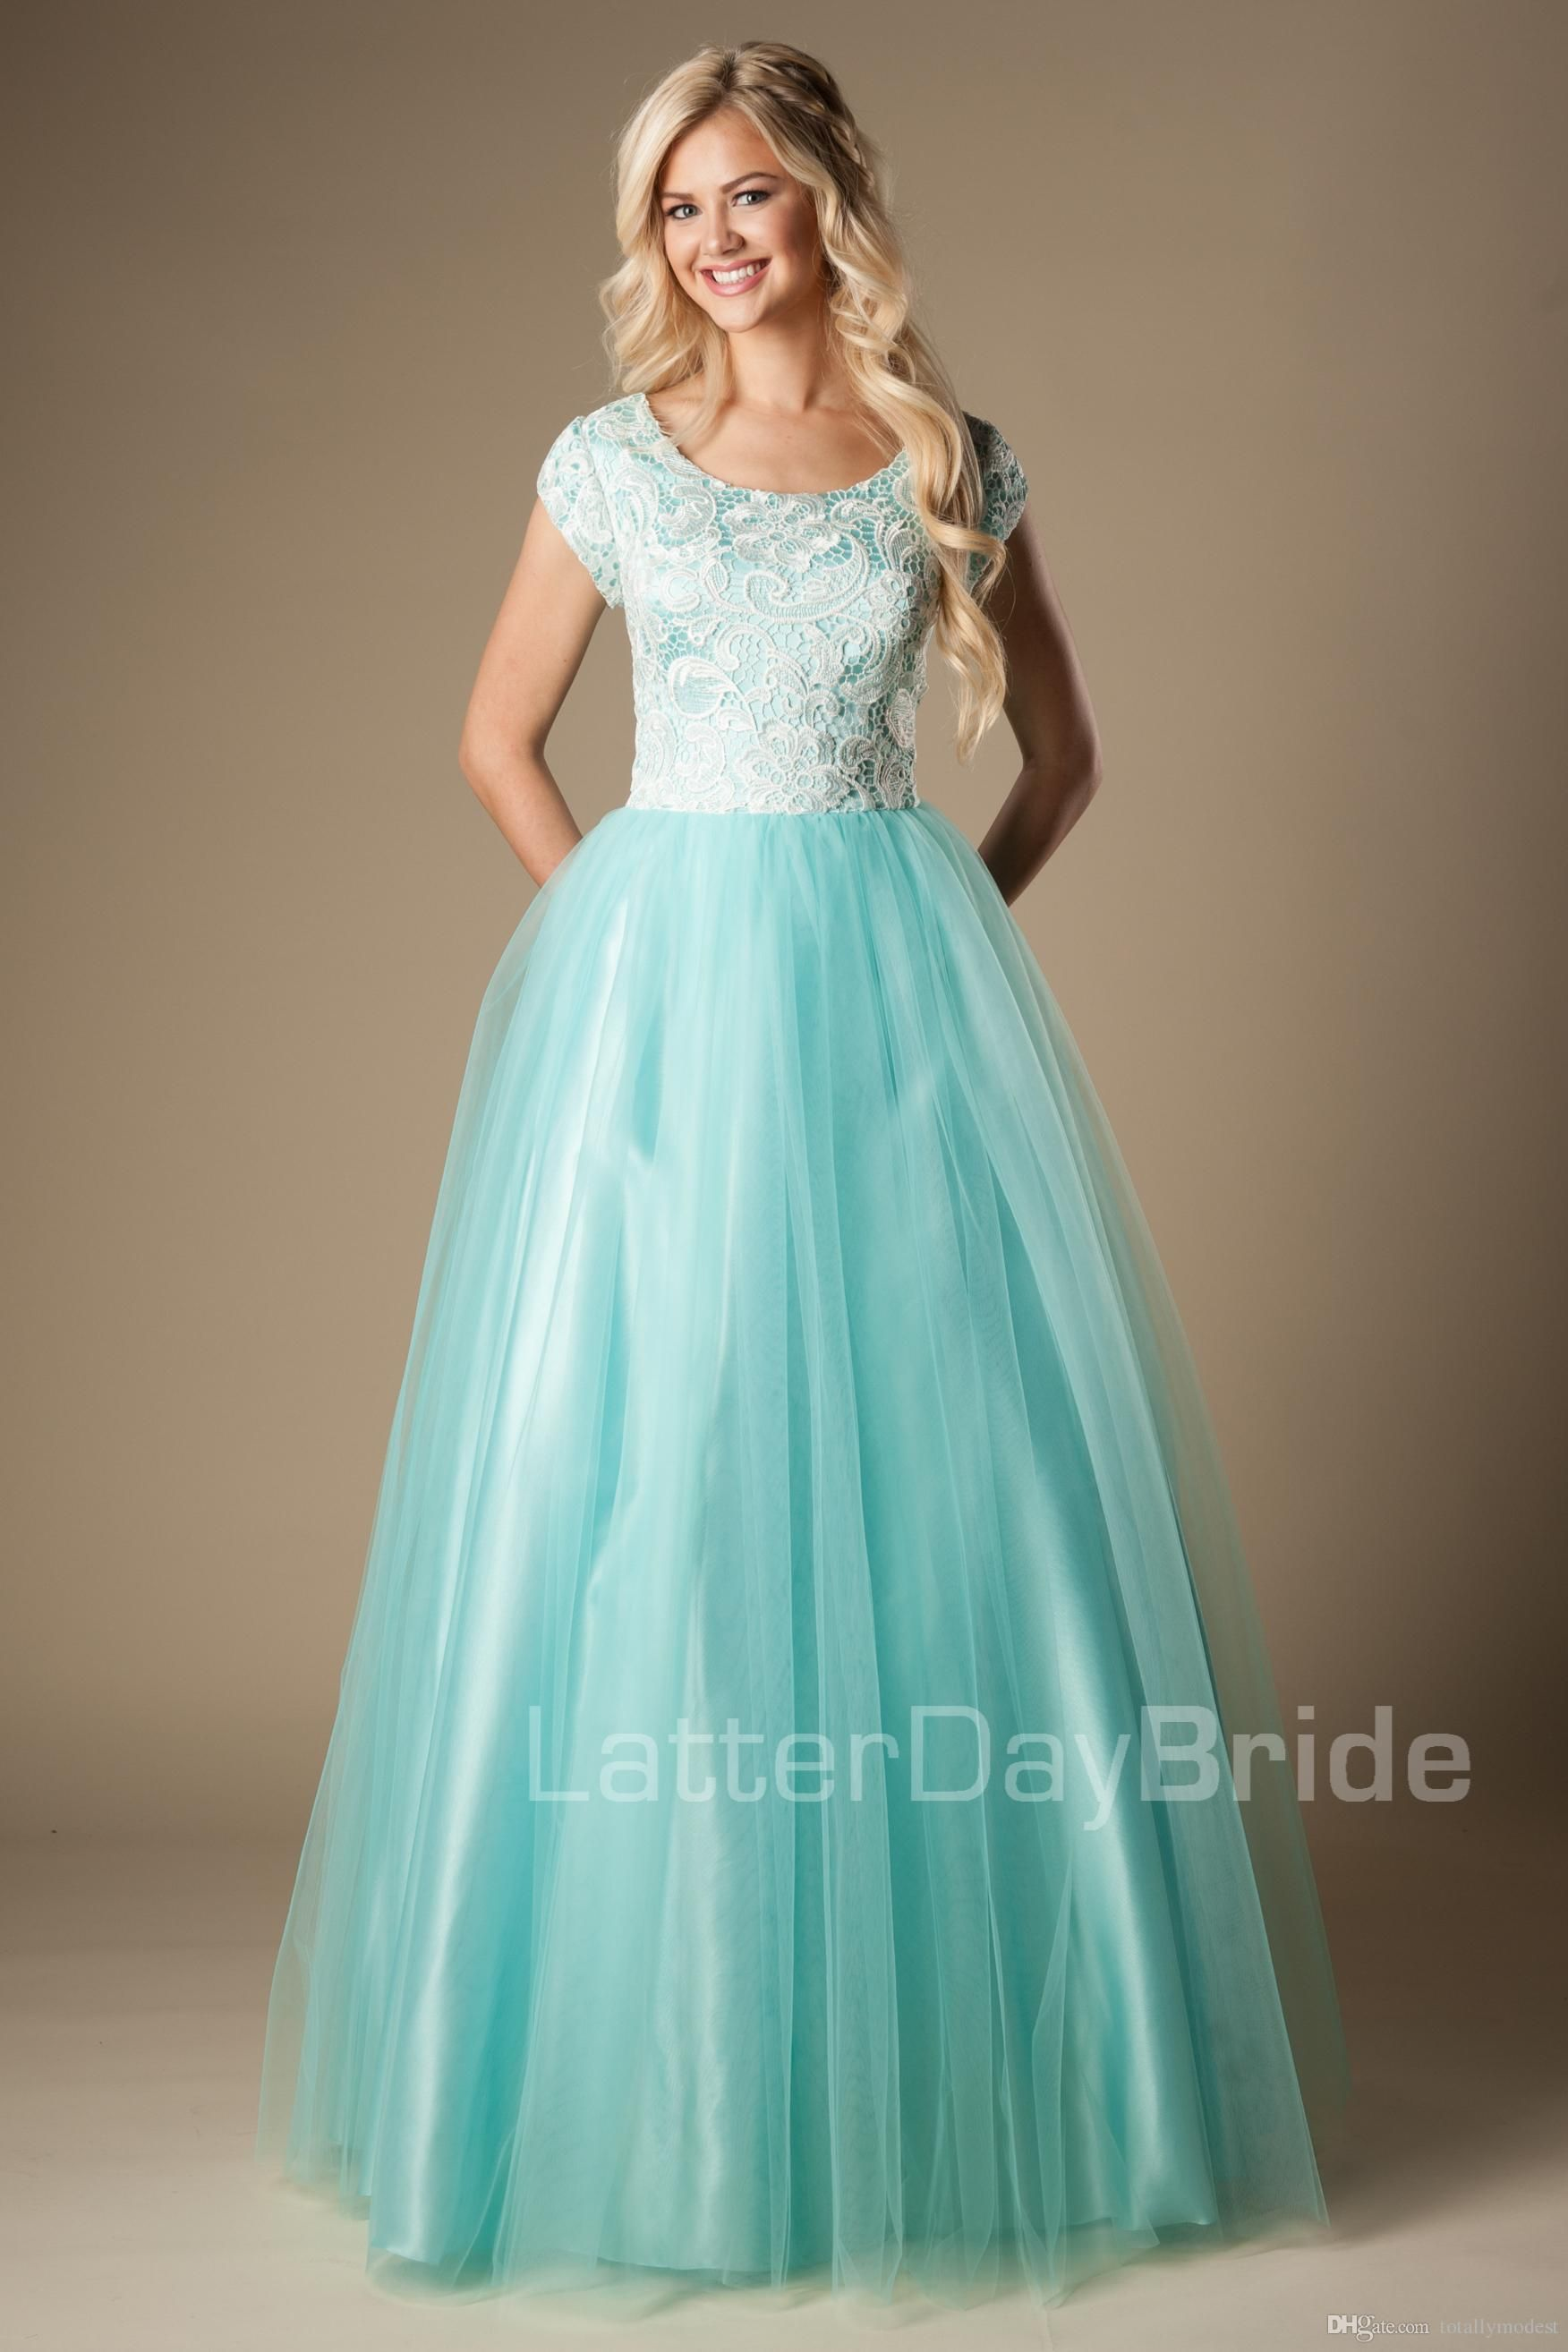 Enchanting Wedding Dresses In Baton Rouge Images - All Wedding ...